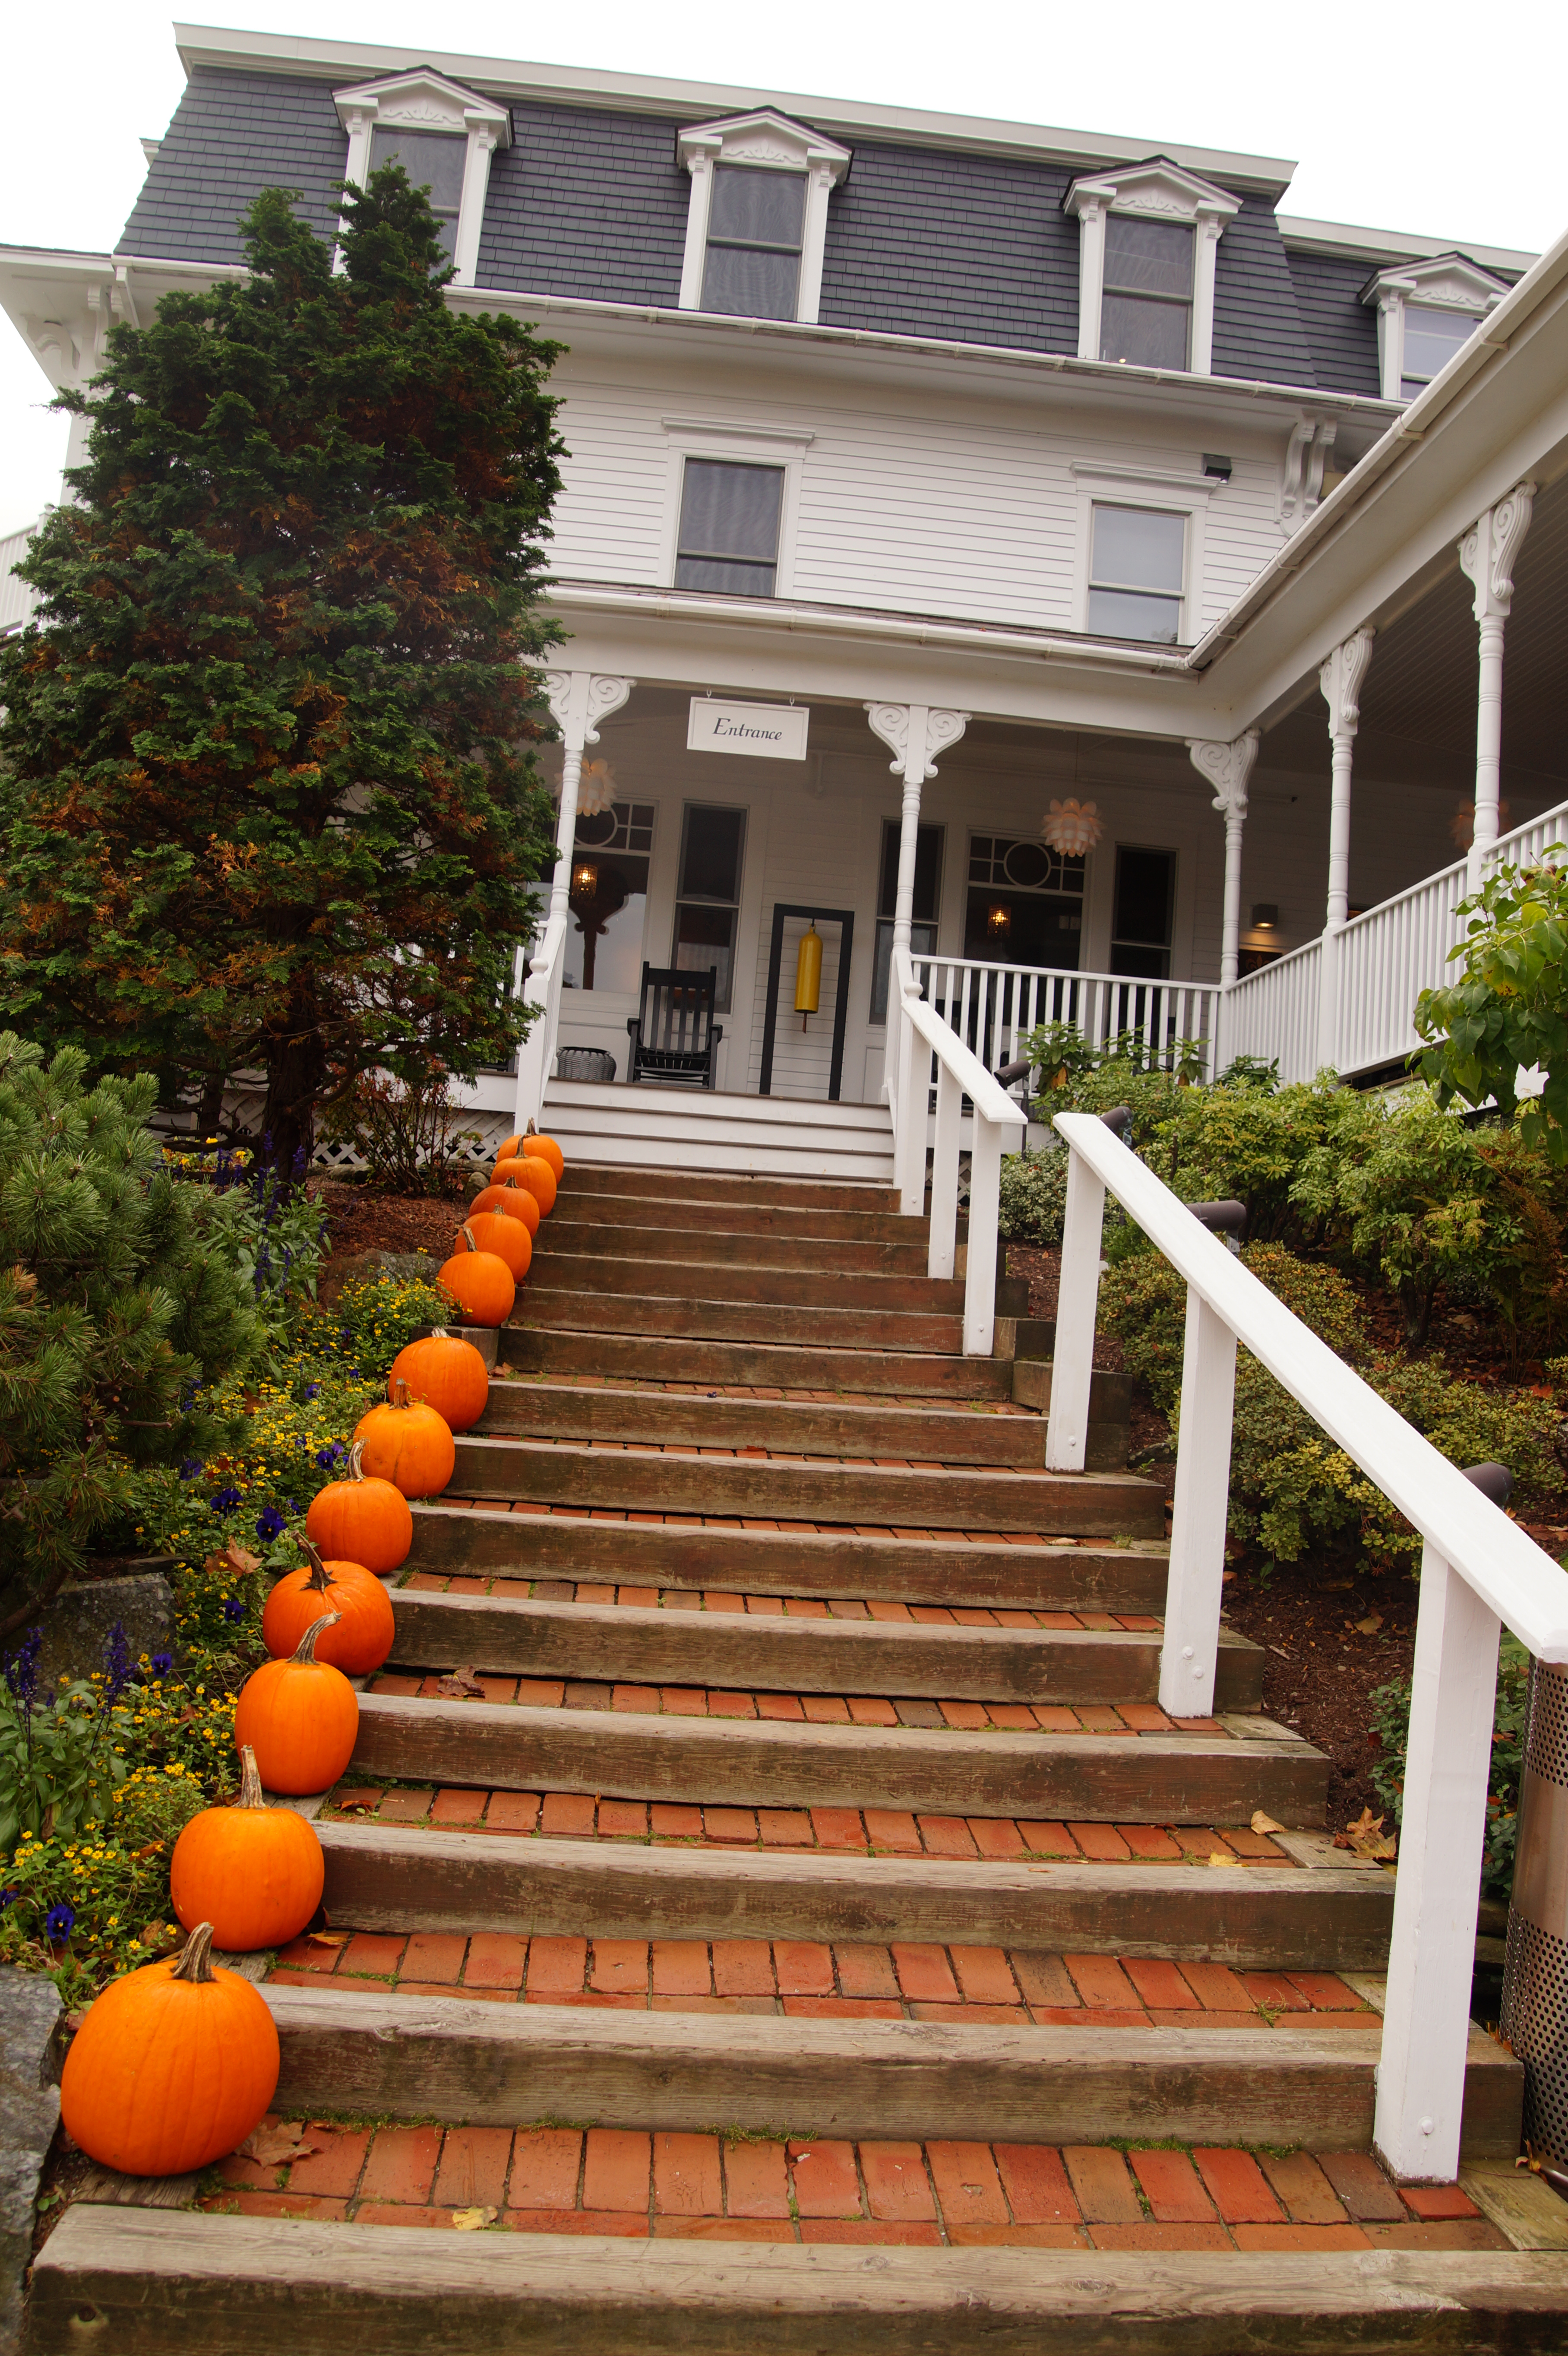 Camden Harbor Inn entry stairs & pumpkins